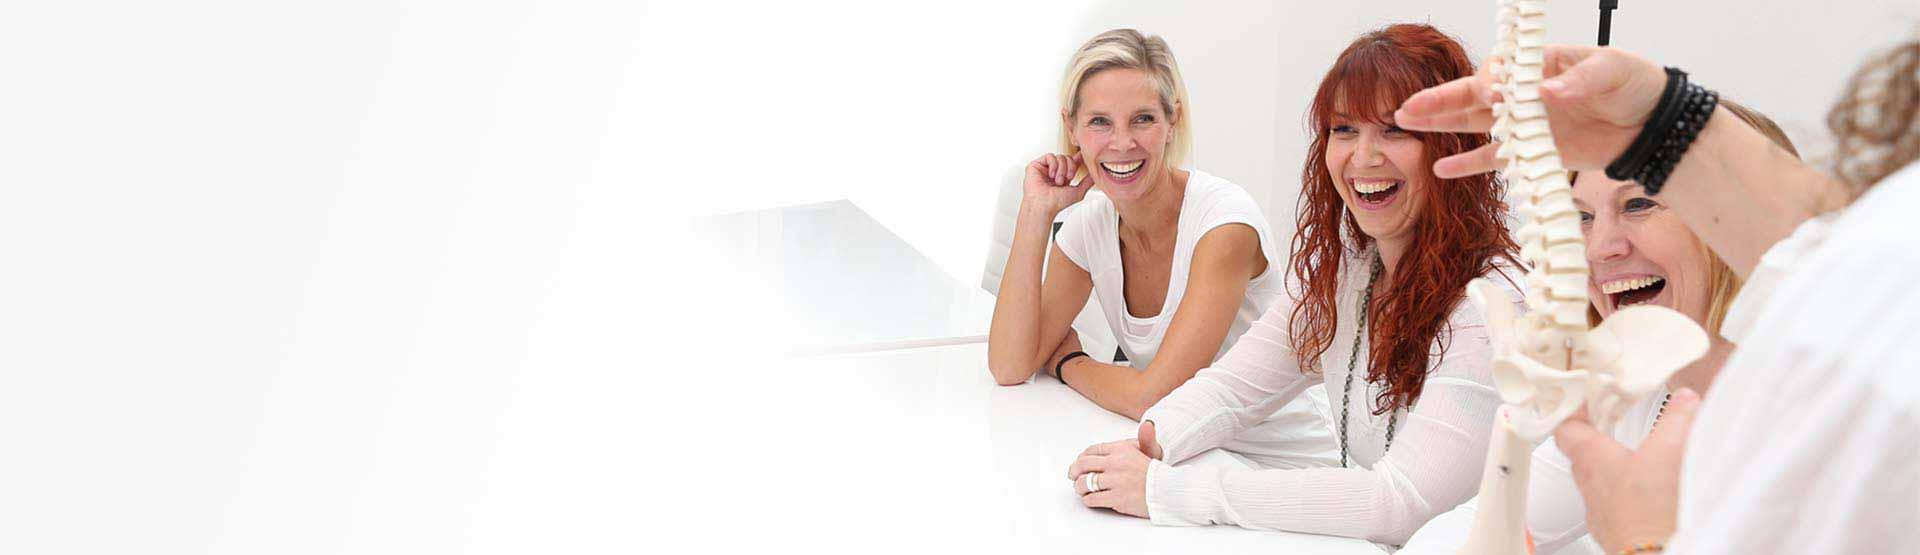 Yogatherapie Ausbildung   Skelett & Muskulatur - WAY Yoga   Werden ...